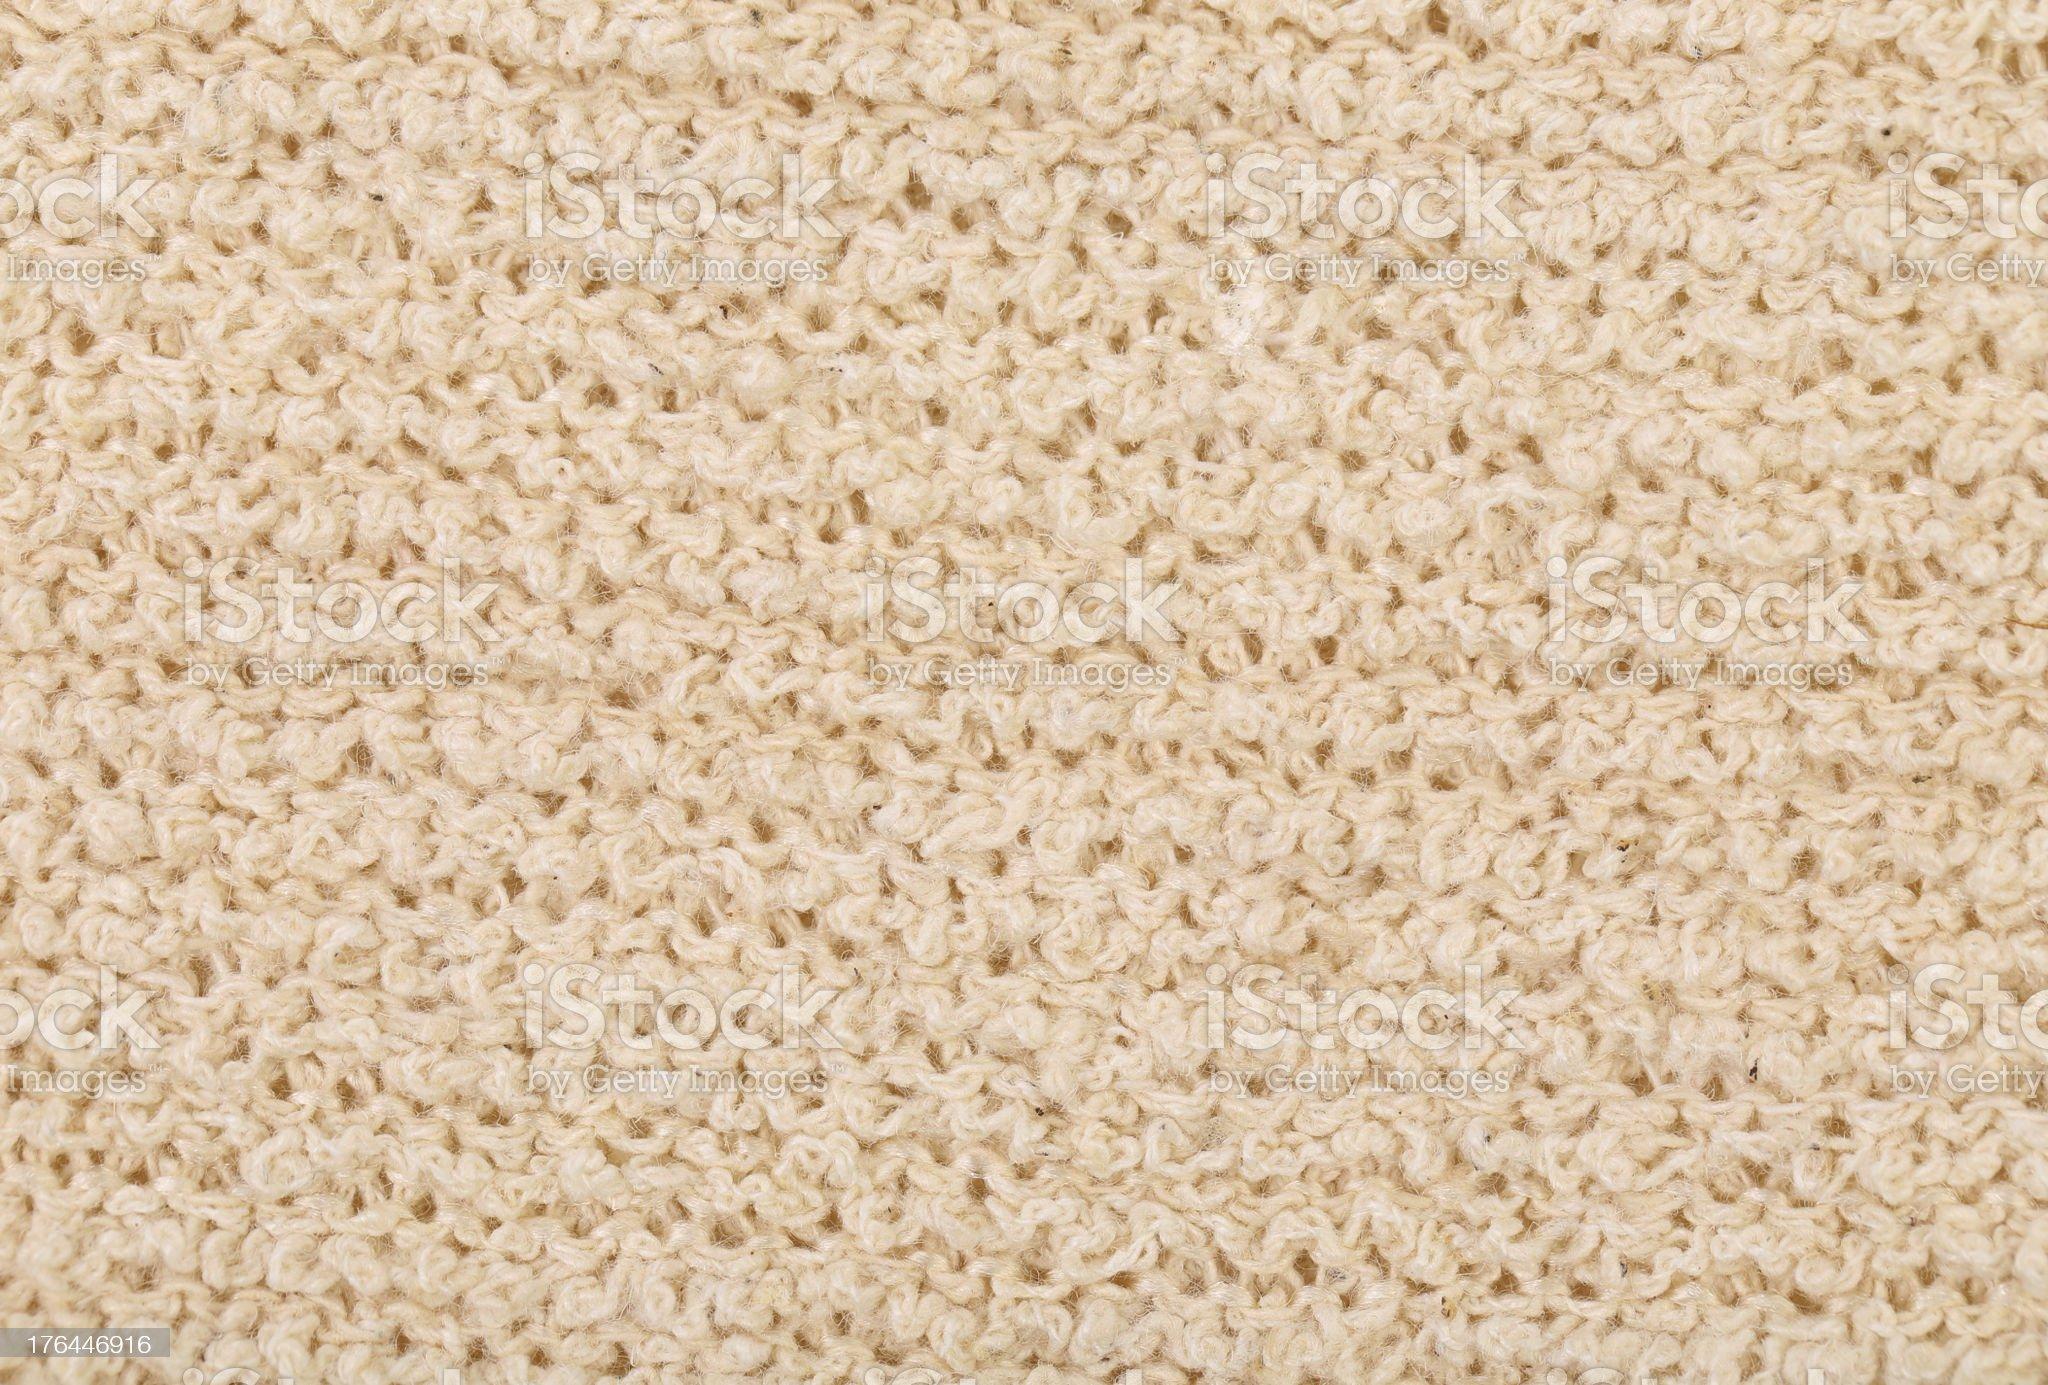 Texture of kitchen glove apron. royalty-free stock photo